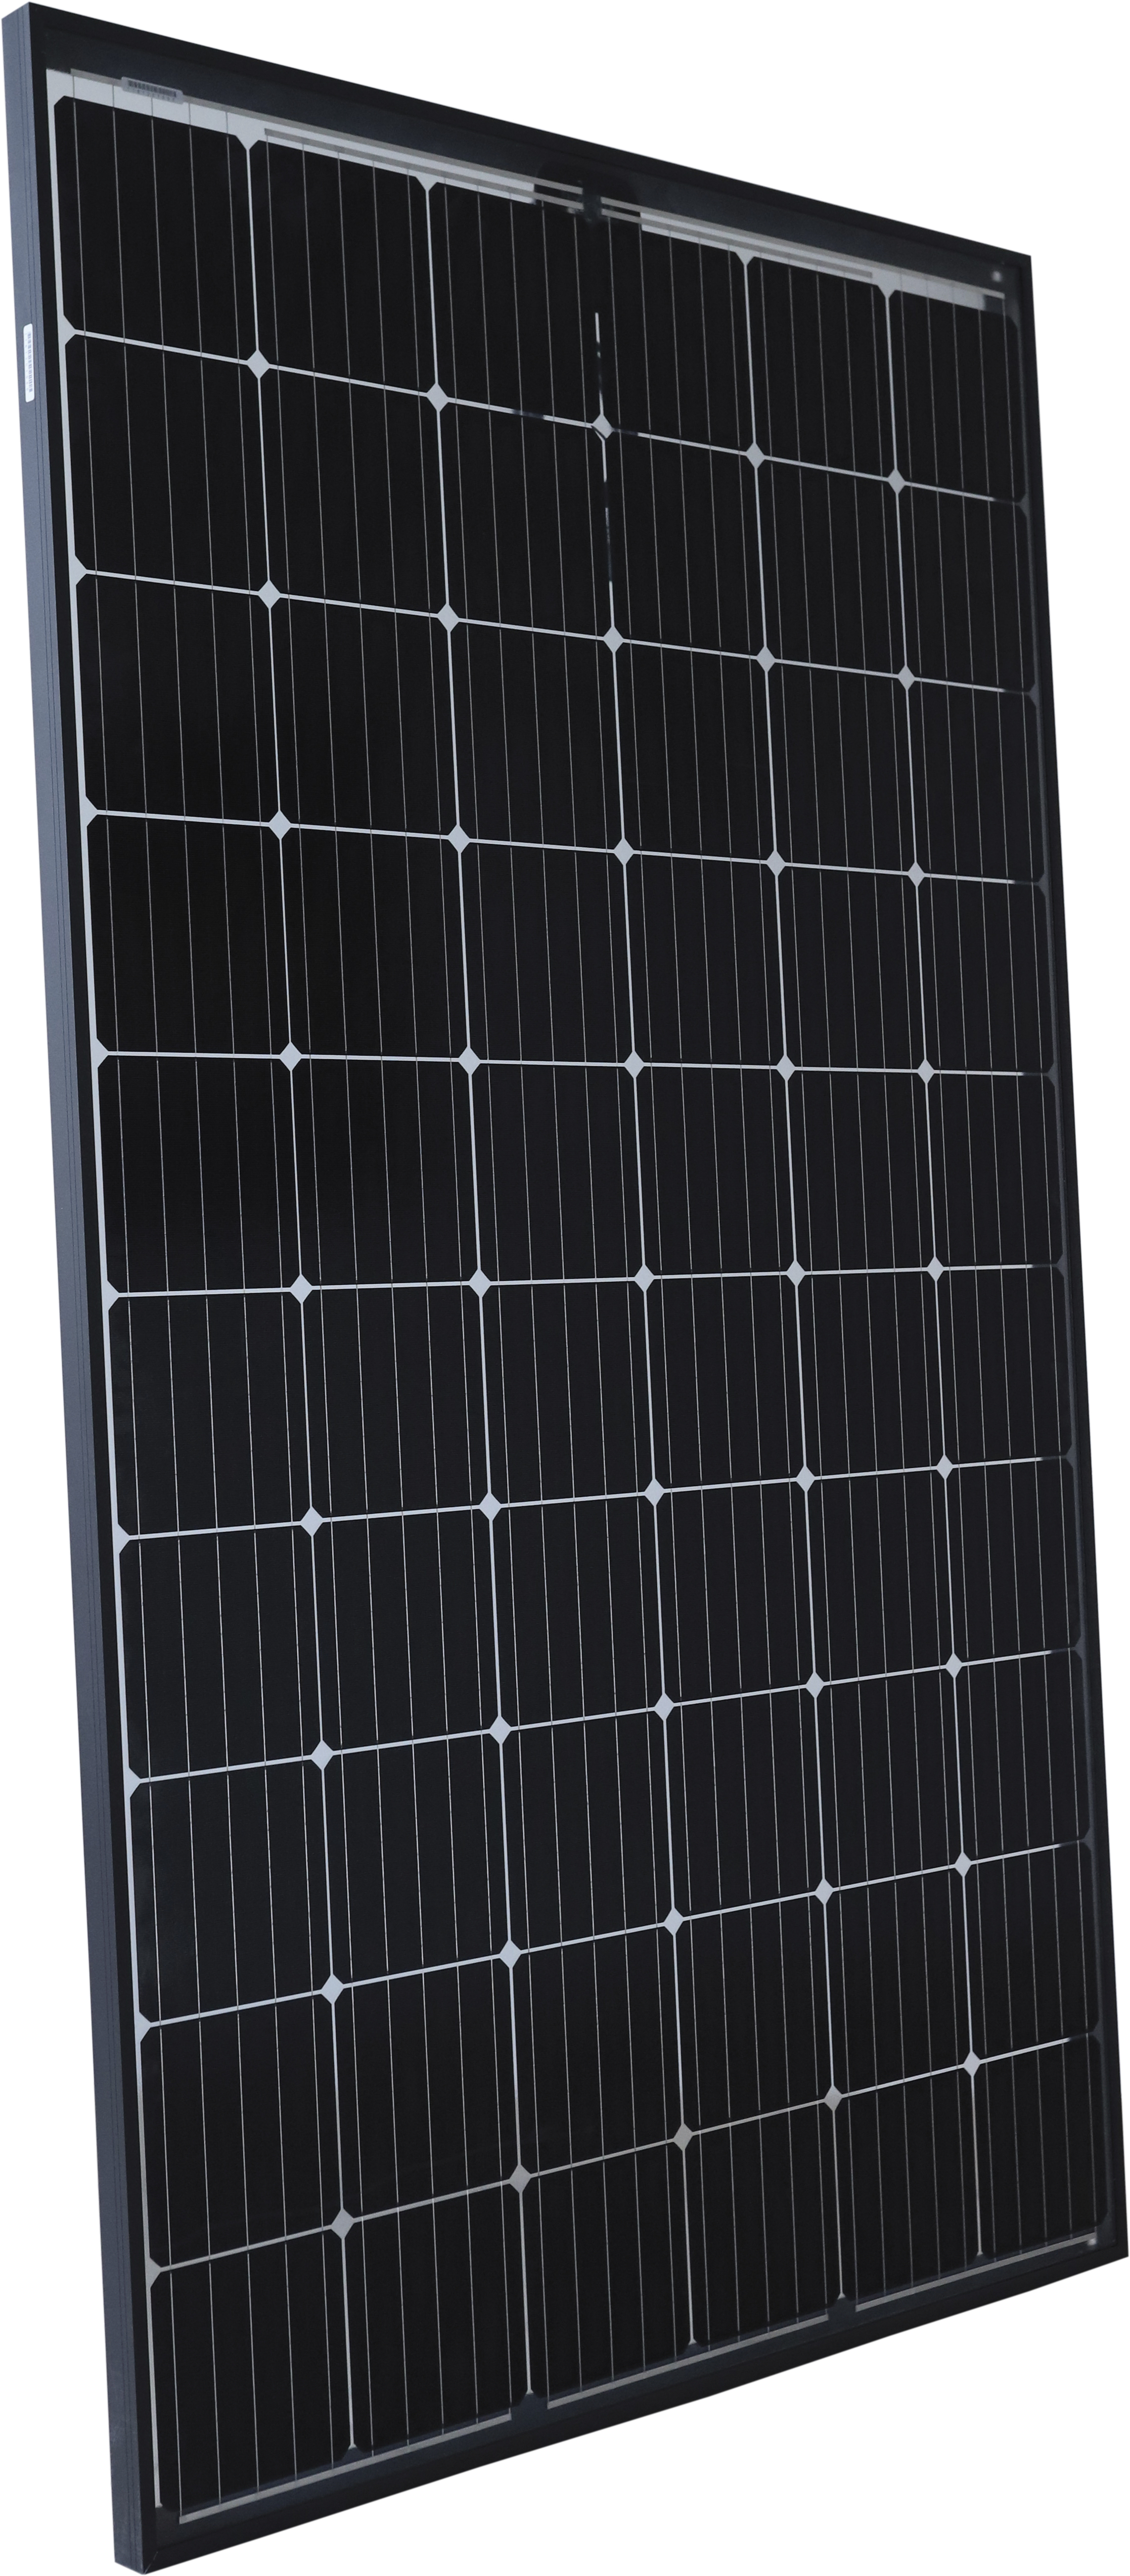 1 Stk EXE Solar GlasGlas 300W mono, IEC, 5 Busbars, 5400 Pascal PVM43000-G